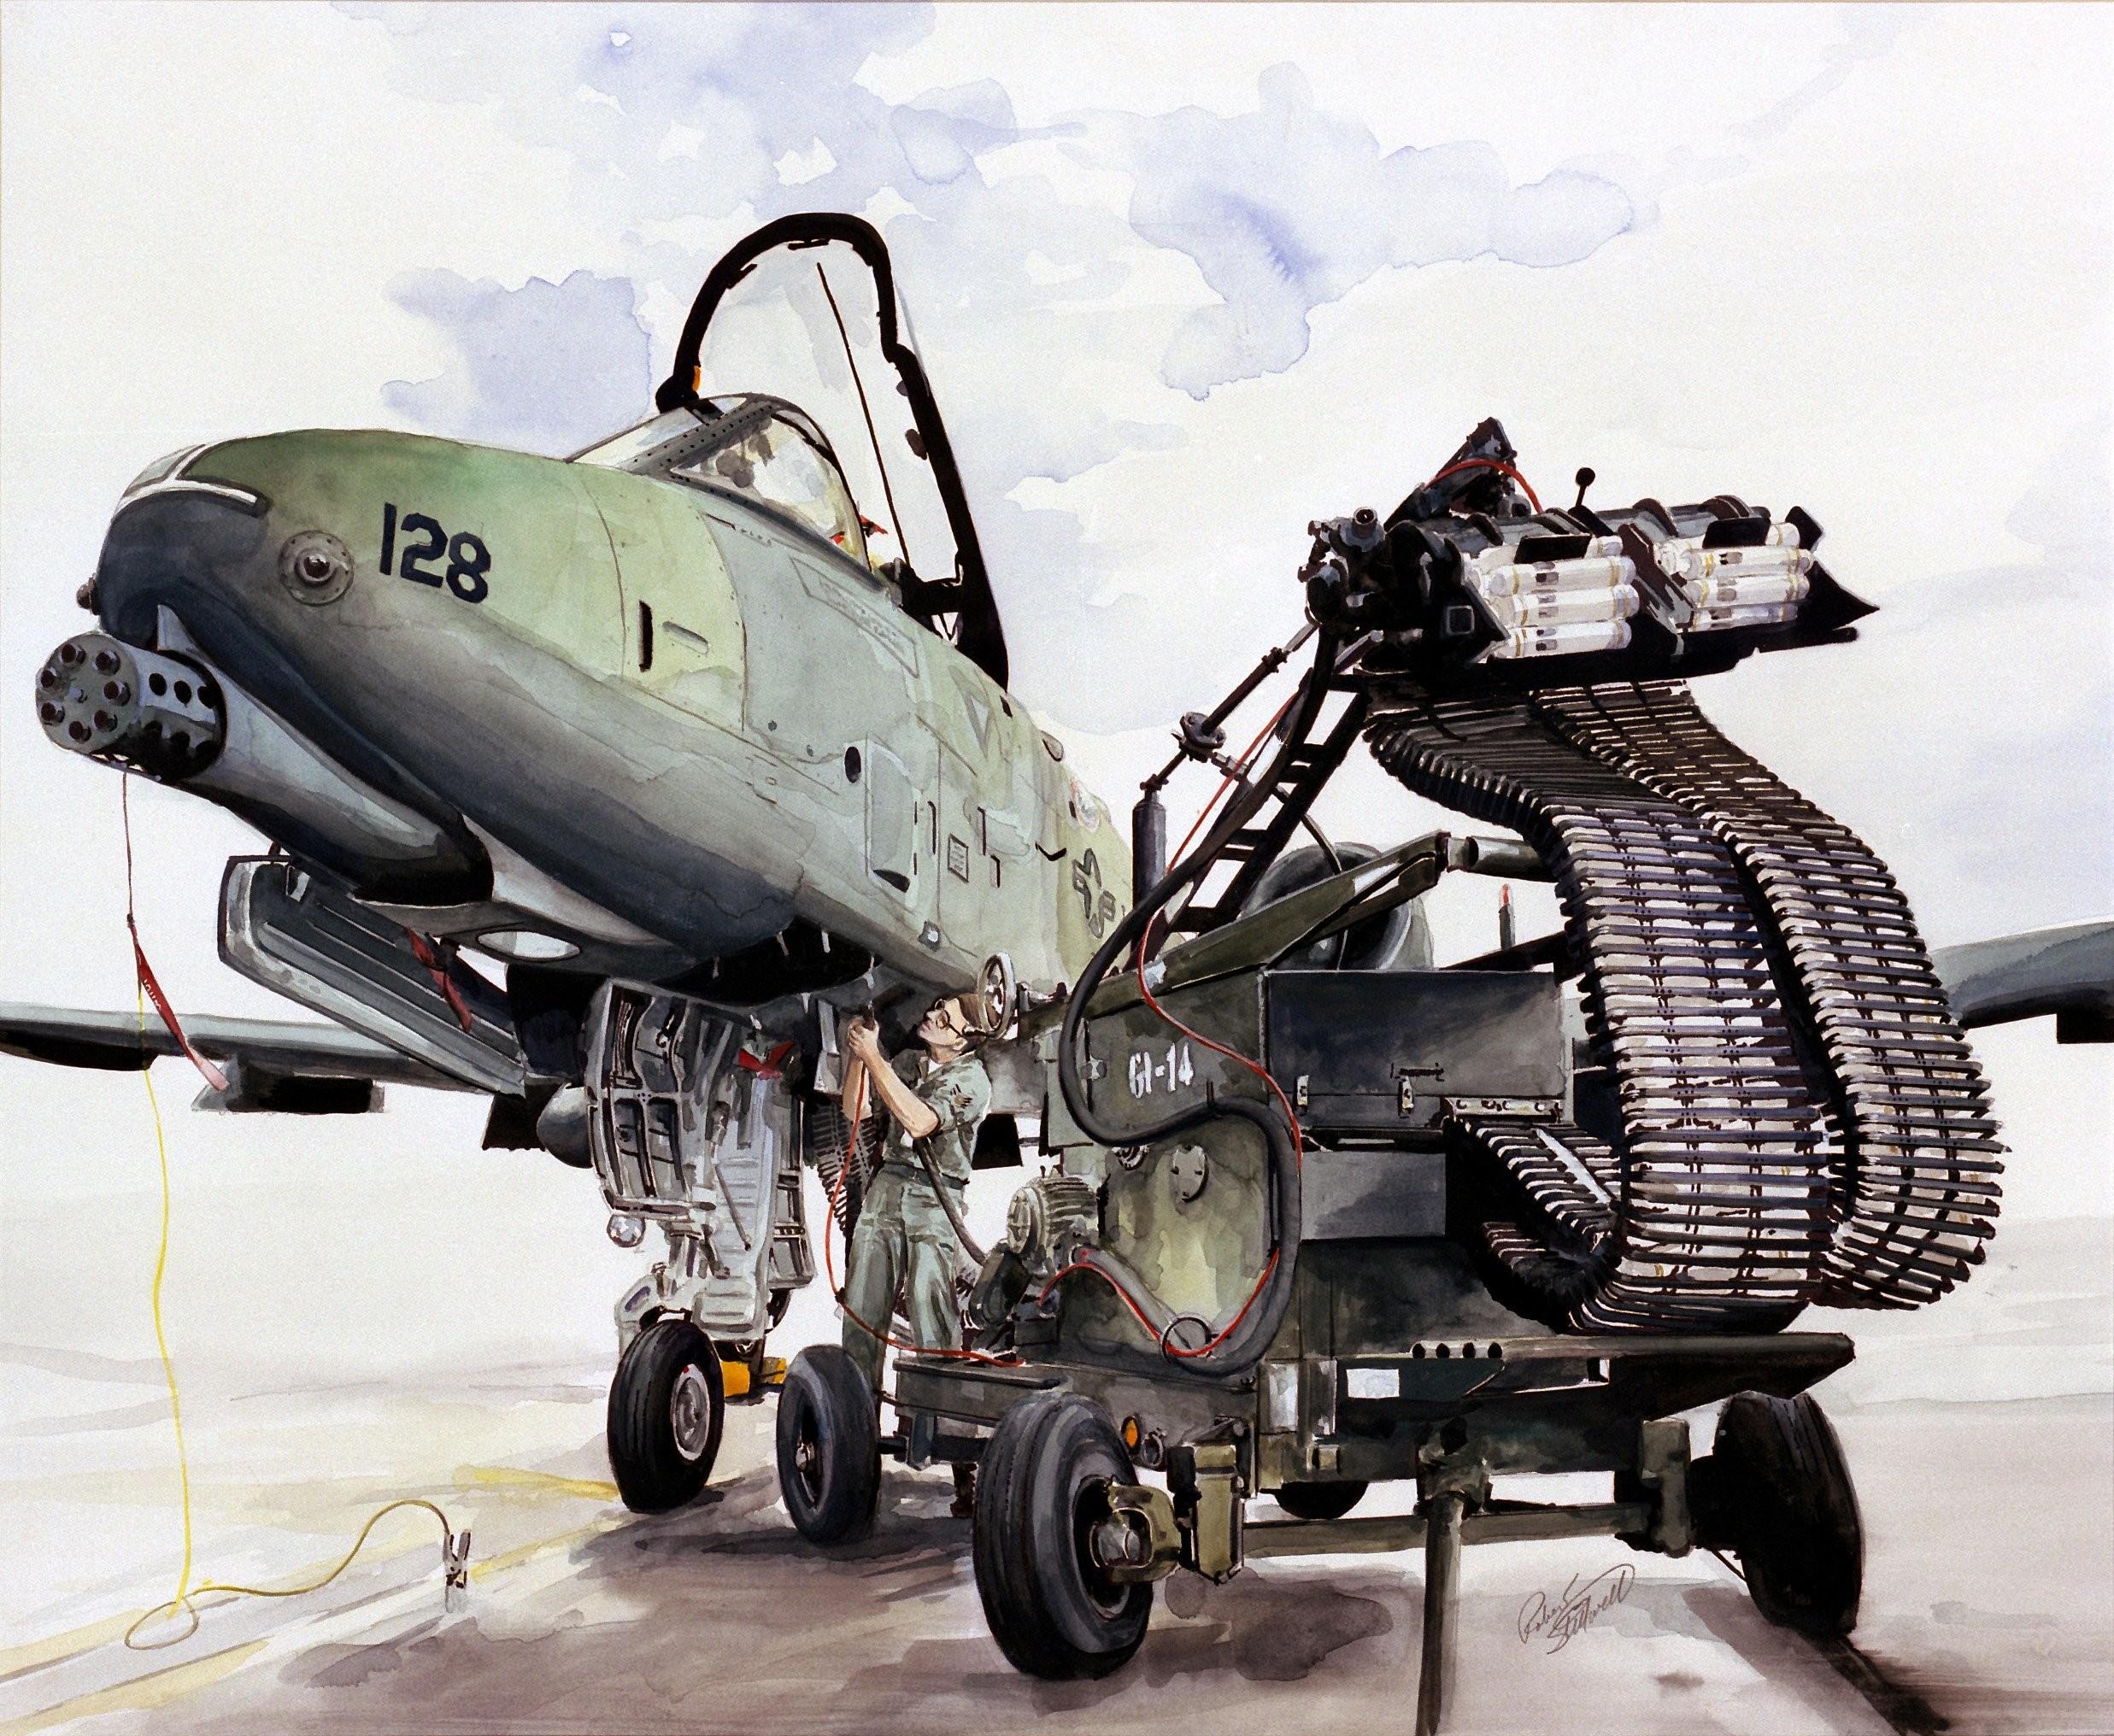 A-10 bomber jet fighter bomb military airplane plane thunderbolt warthog  (34) wallpaper | | 250729 | WallpaperUP